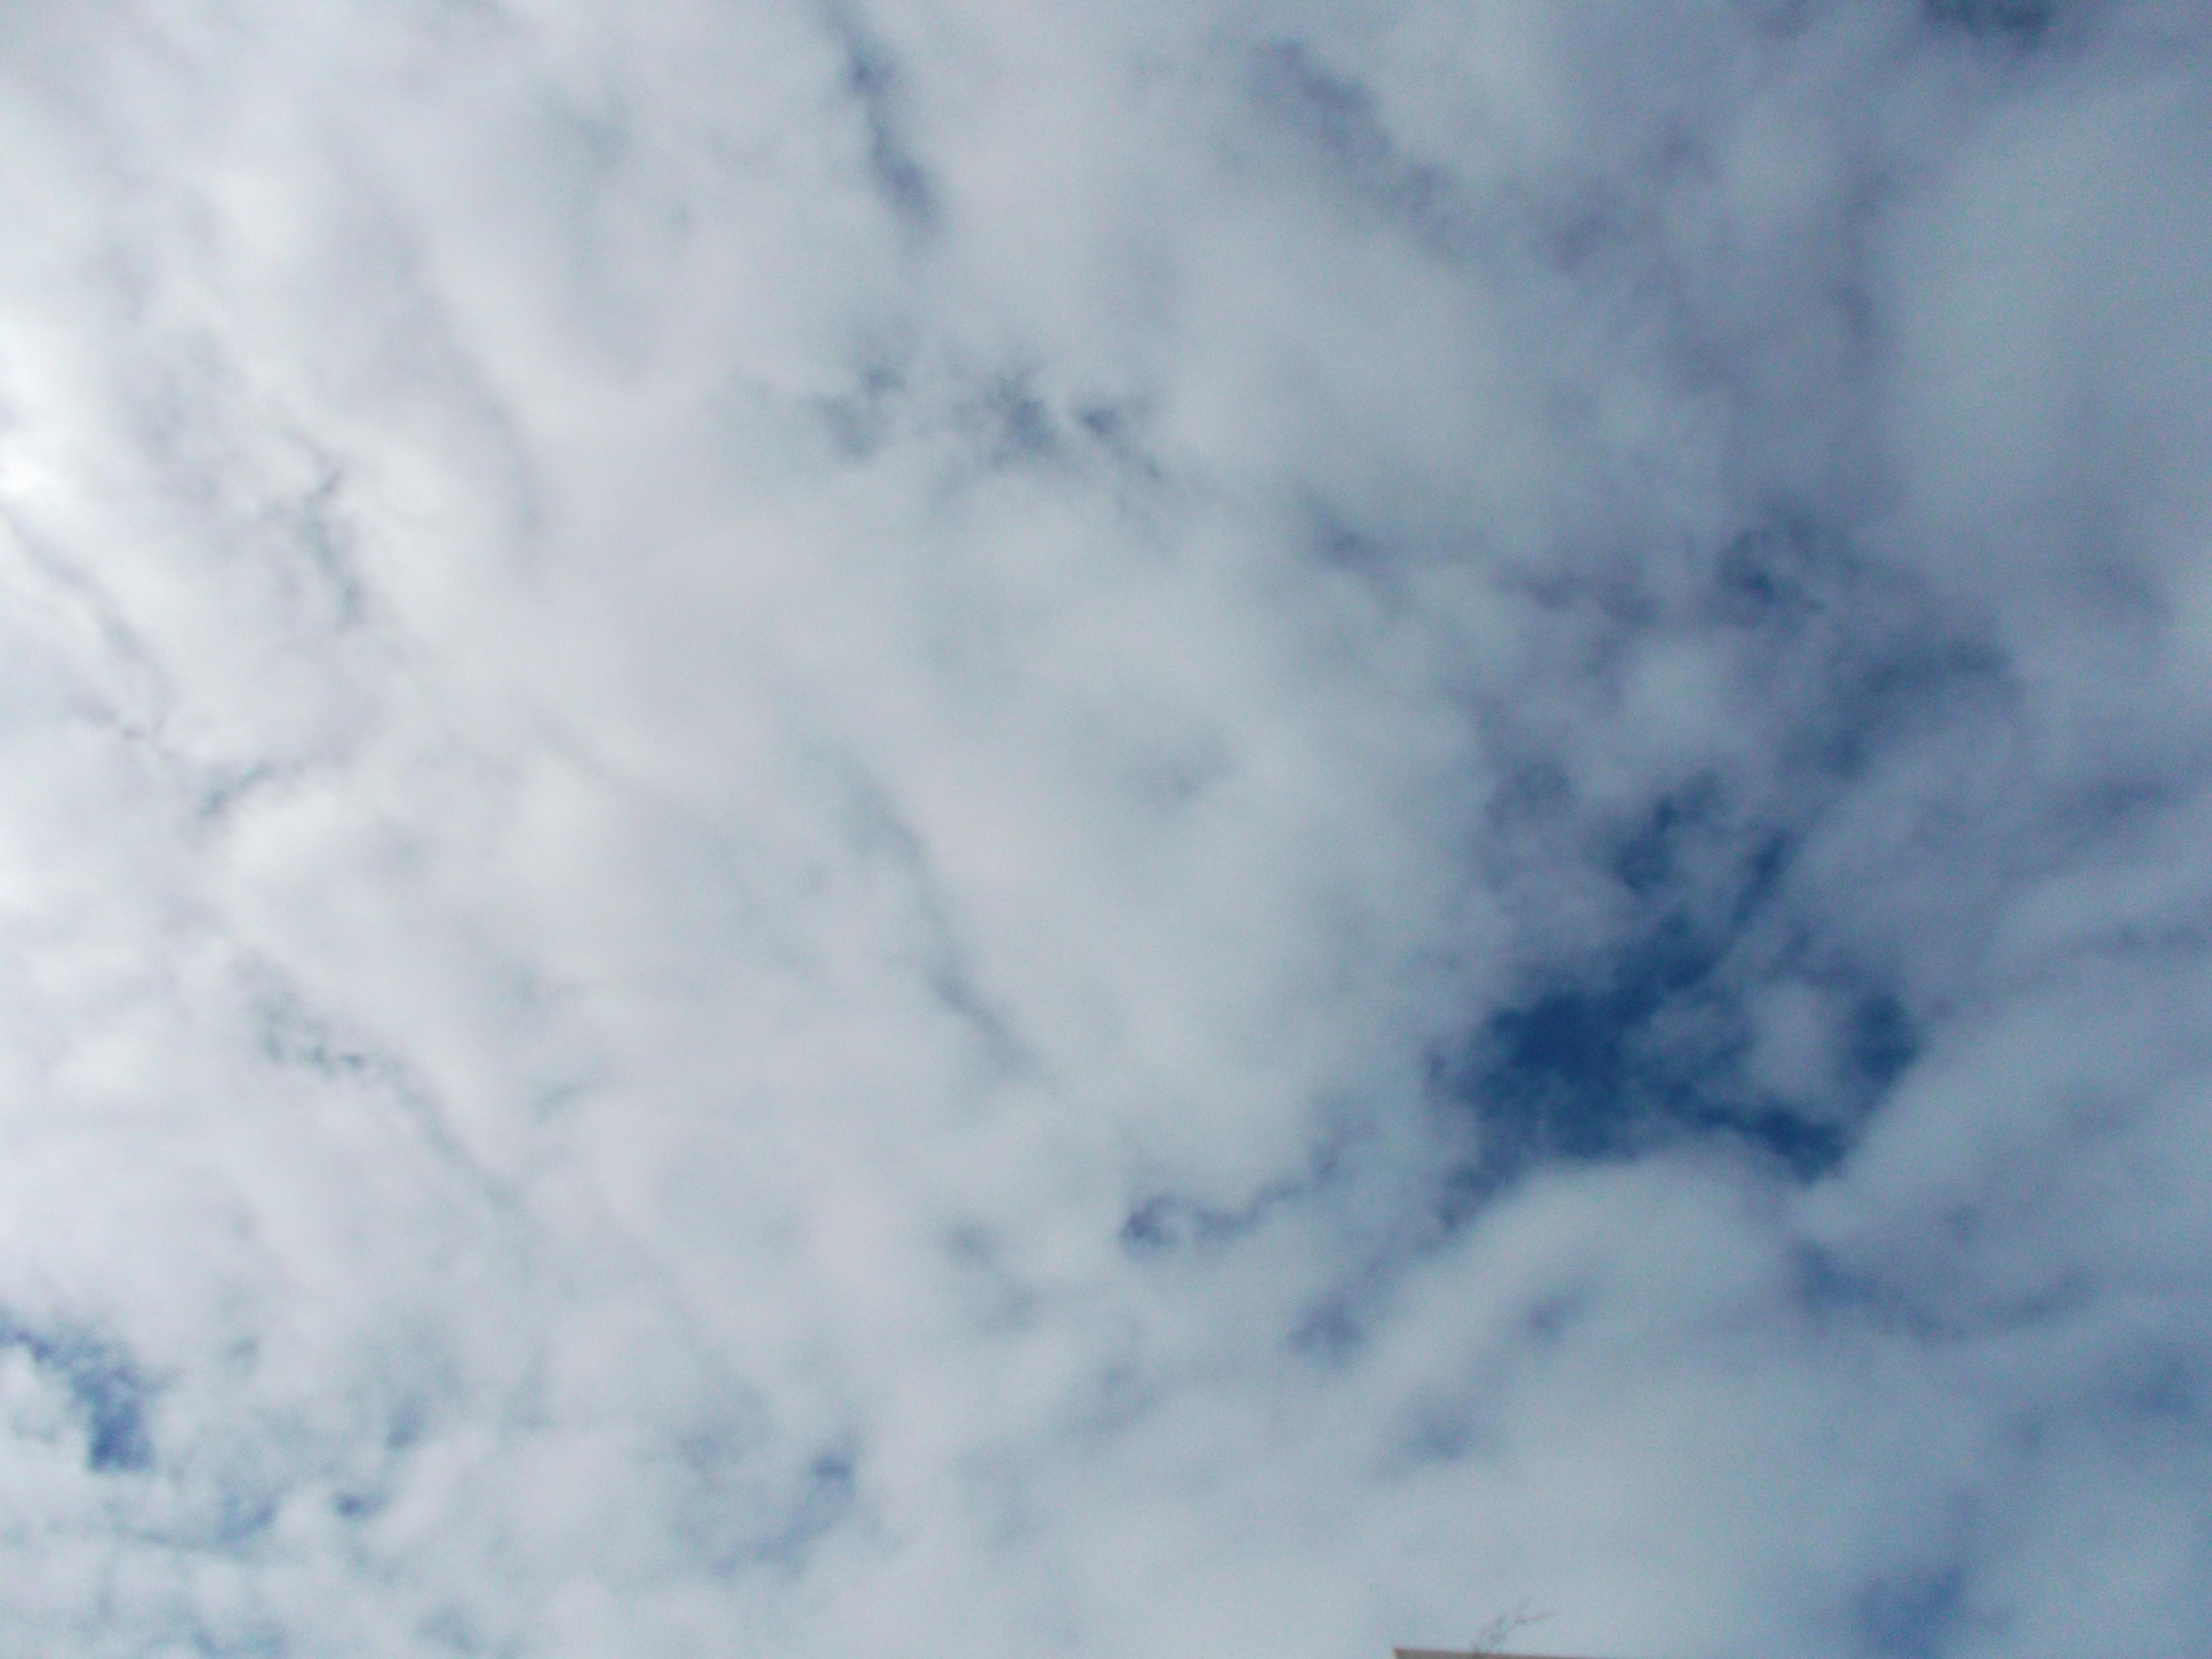 2013-03-13 Longitude -0.360578 Latitude 49.168919 Altitude 29 Heure 13h01